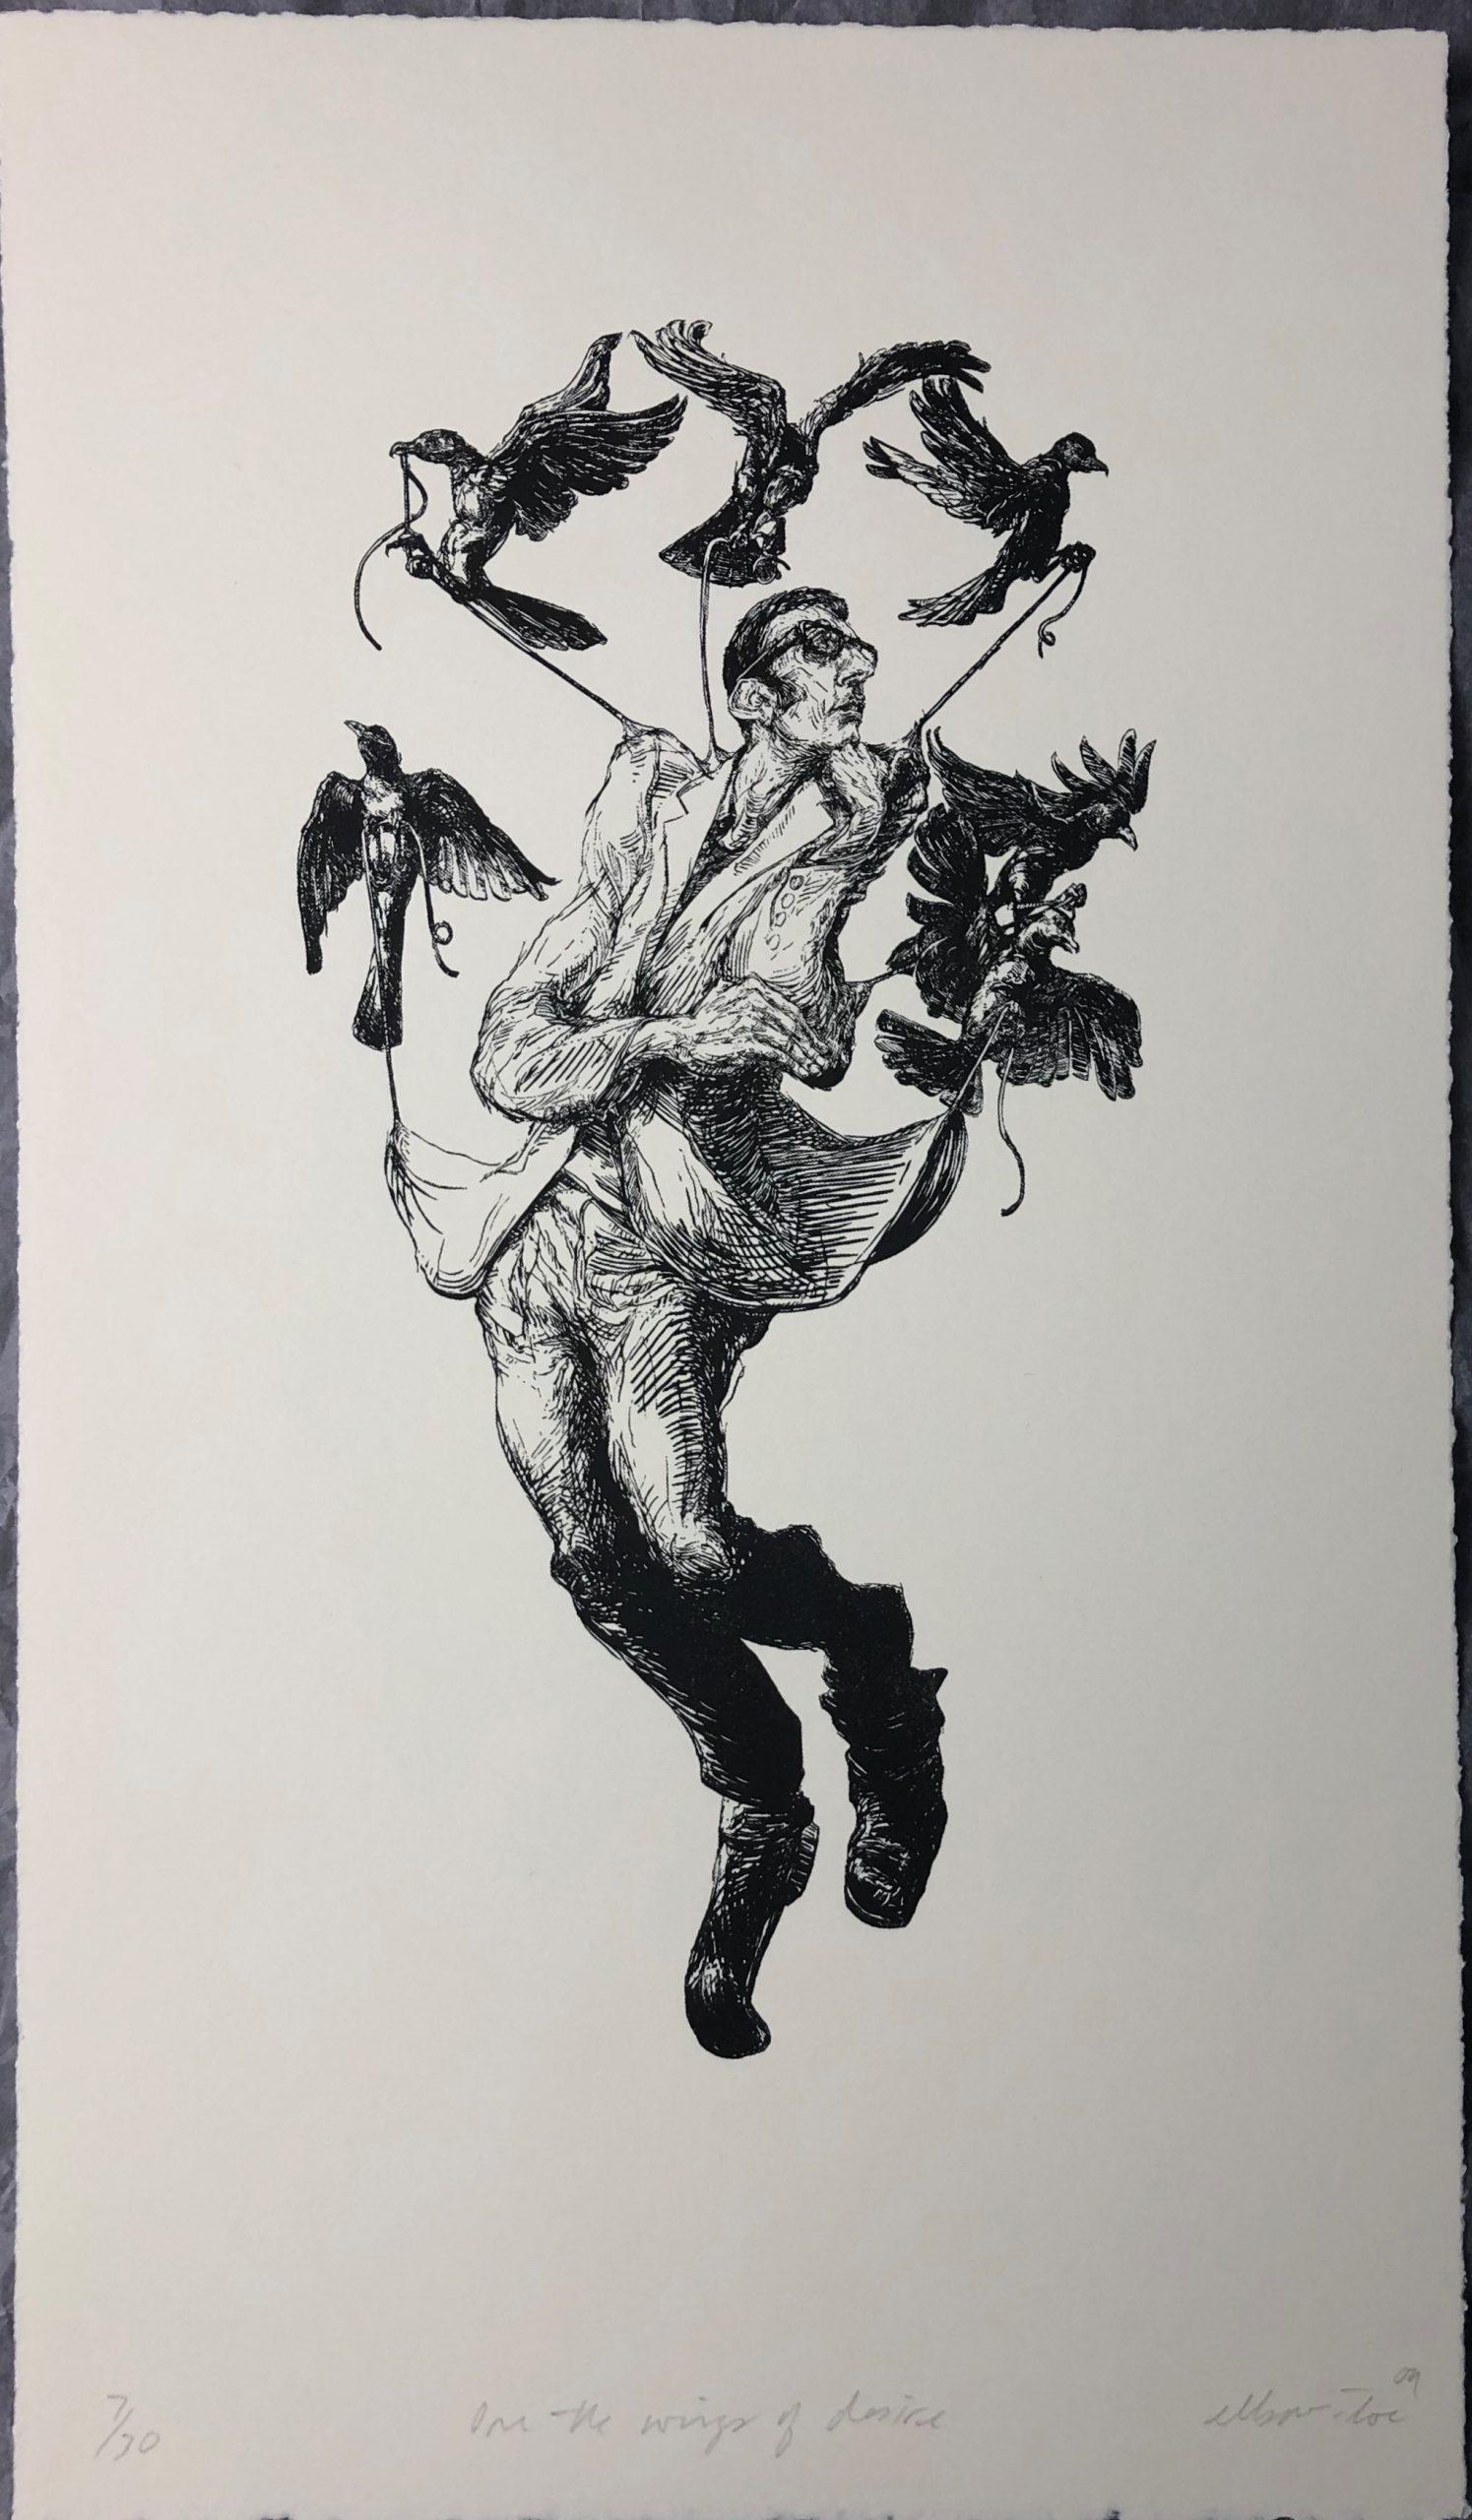 "Elbow Toe ""On the Wings of Desire"" by Brian Adam Douglas aka Elbow Toe"